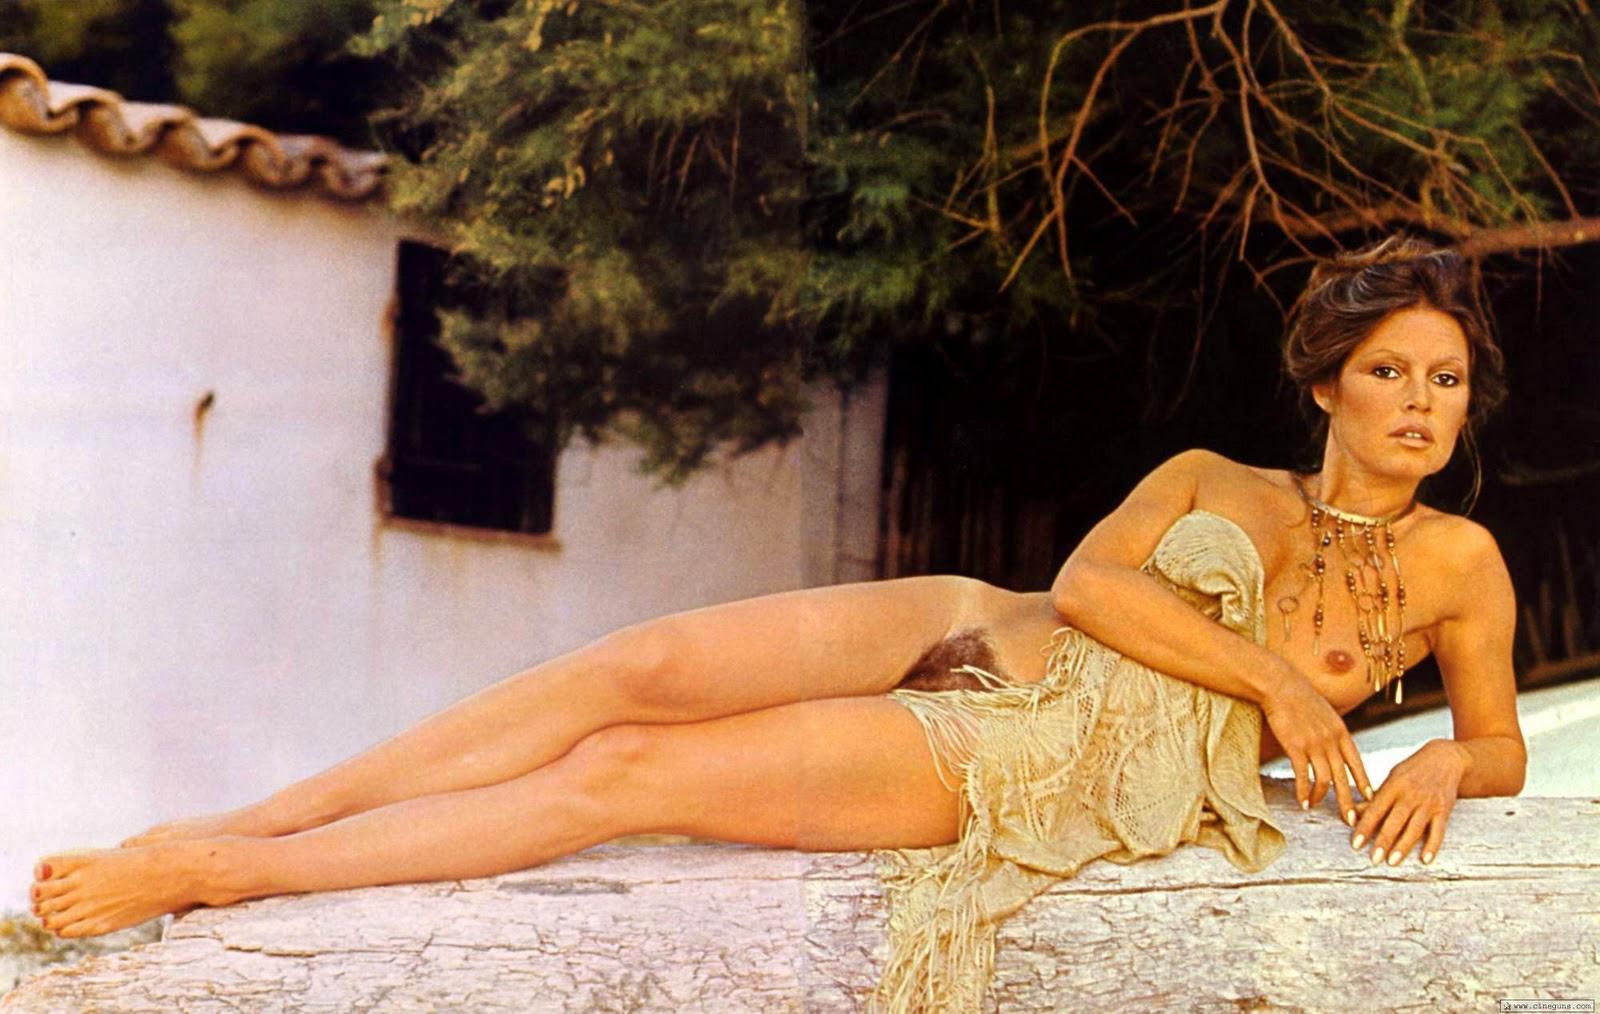 http://3.bp.blogspot.com/-pXhrxcduBSM/UOxDVFb2lFI/AAAAAAAAArY/X2UrwQ0xNa0/s1600/Brigitte+Bardot+nude.jpeg